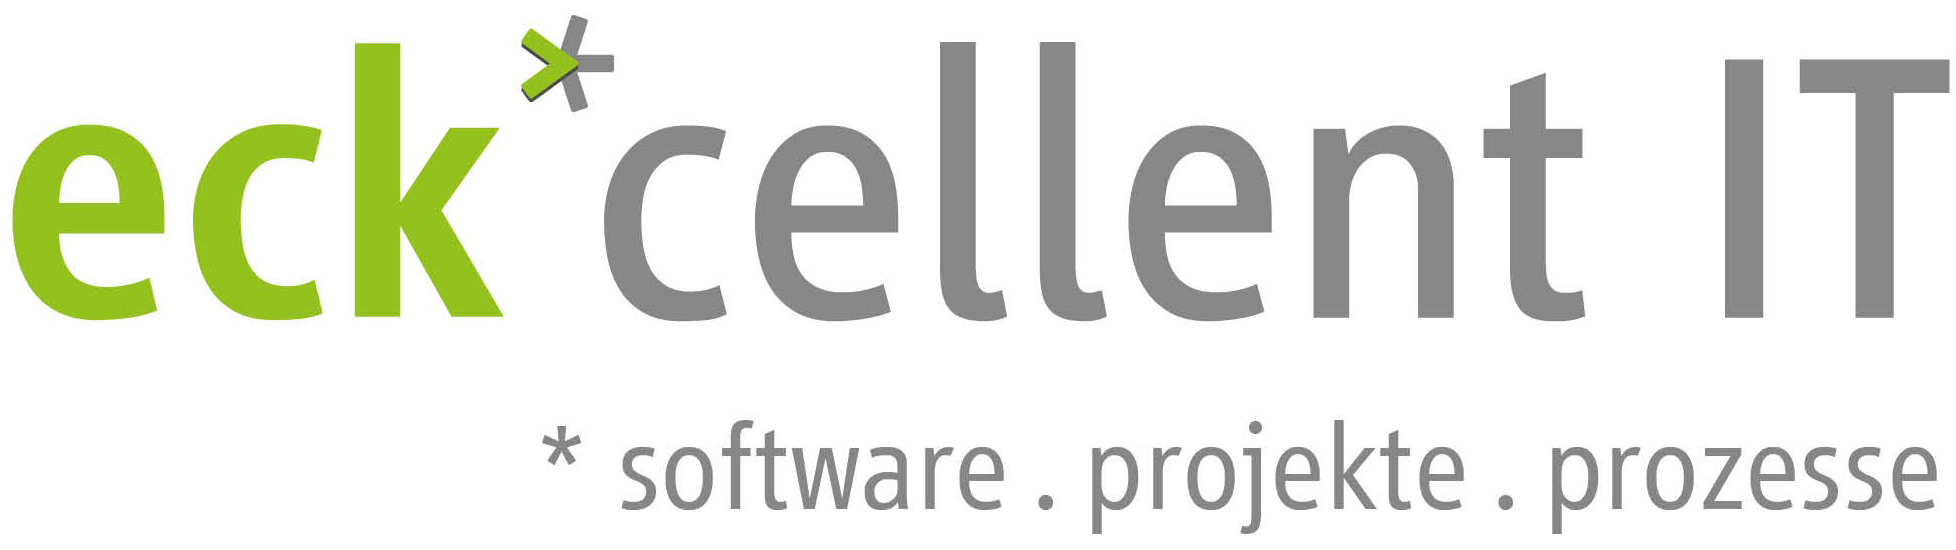 eck_Logo_claim_software